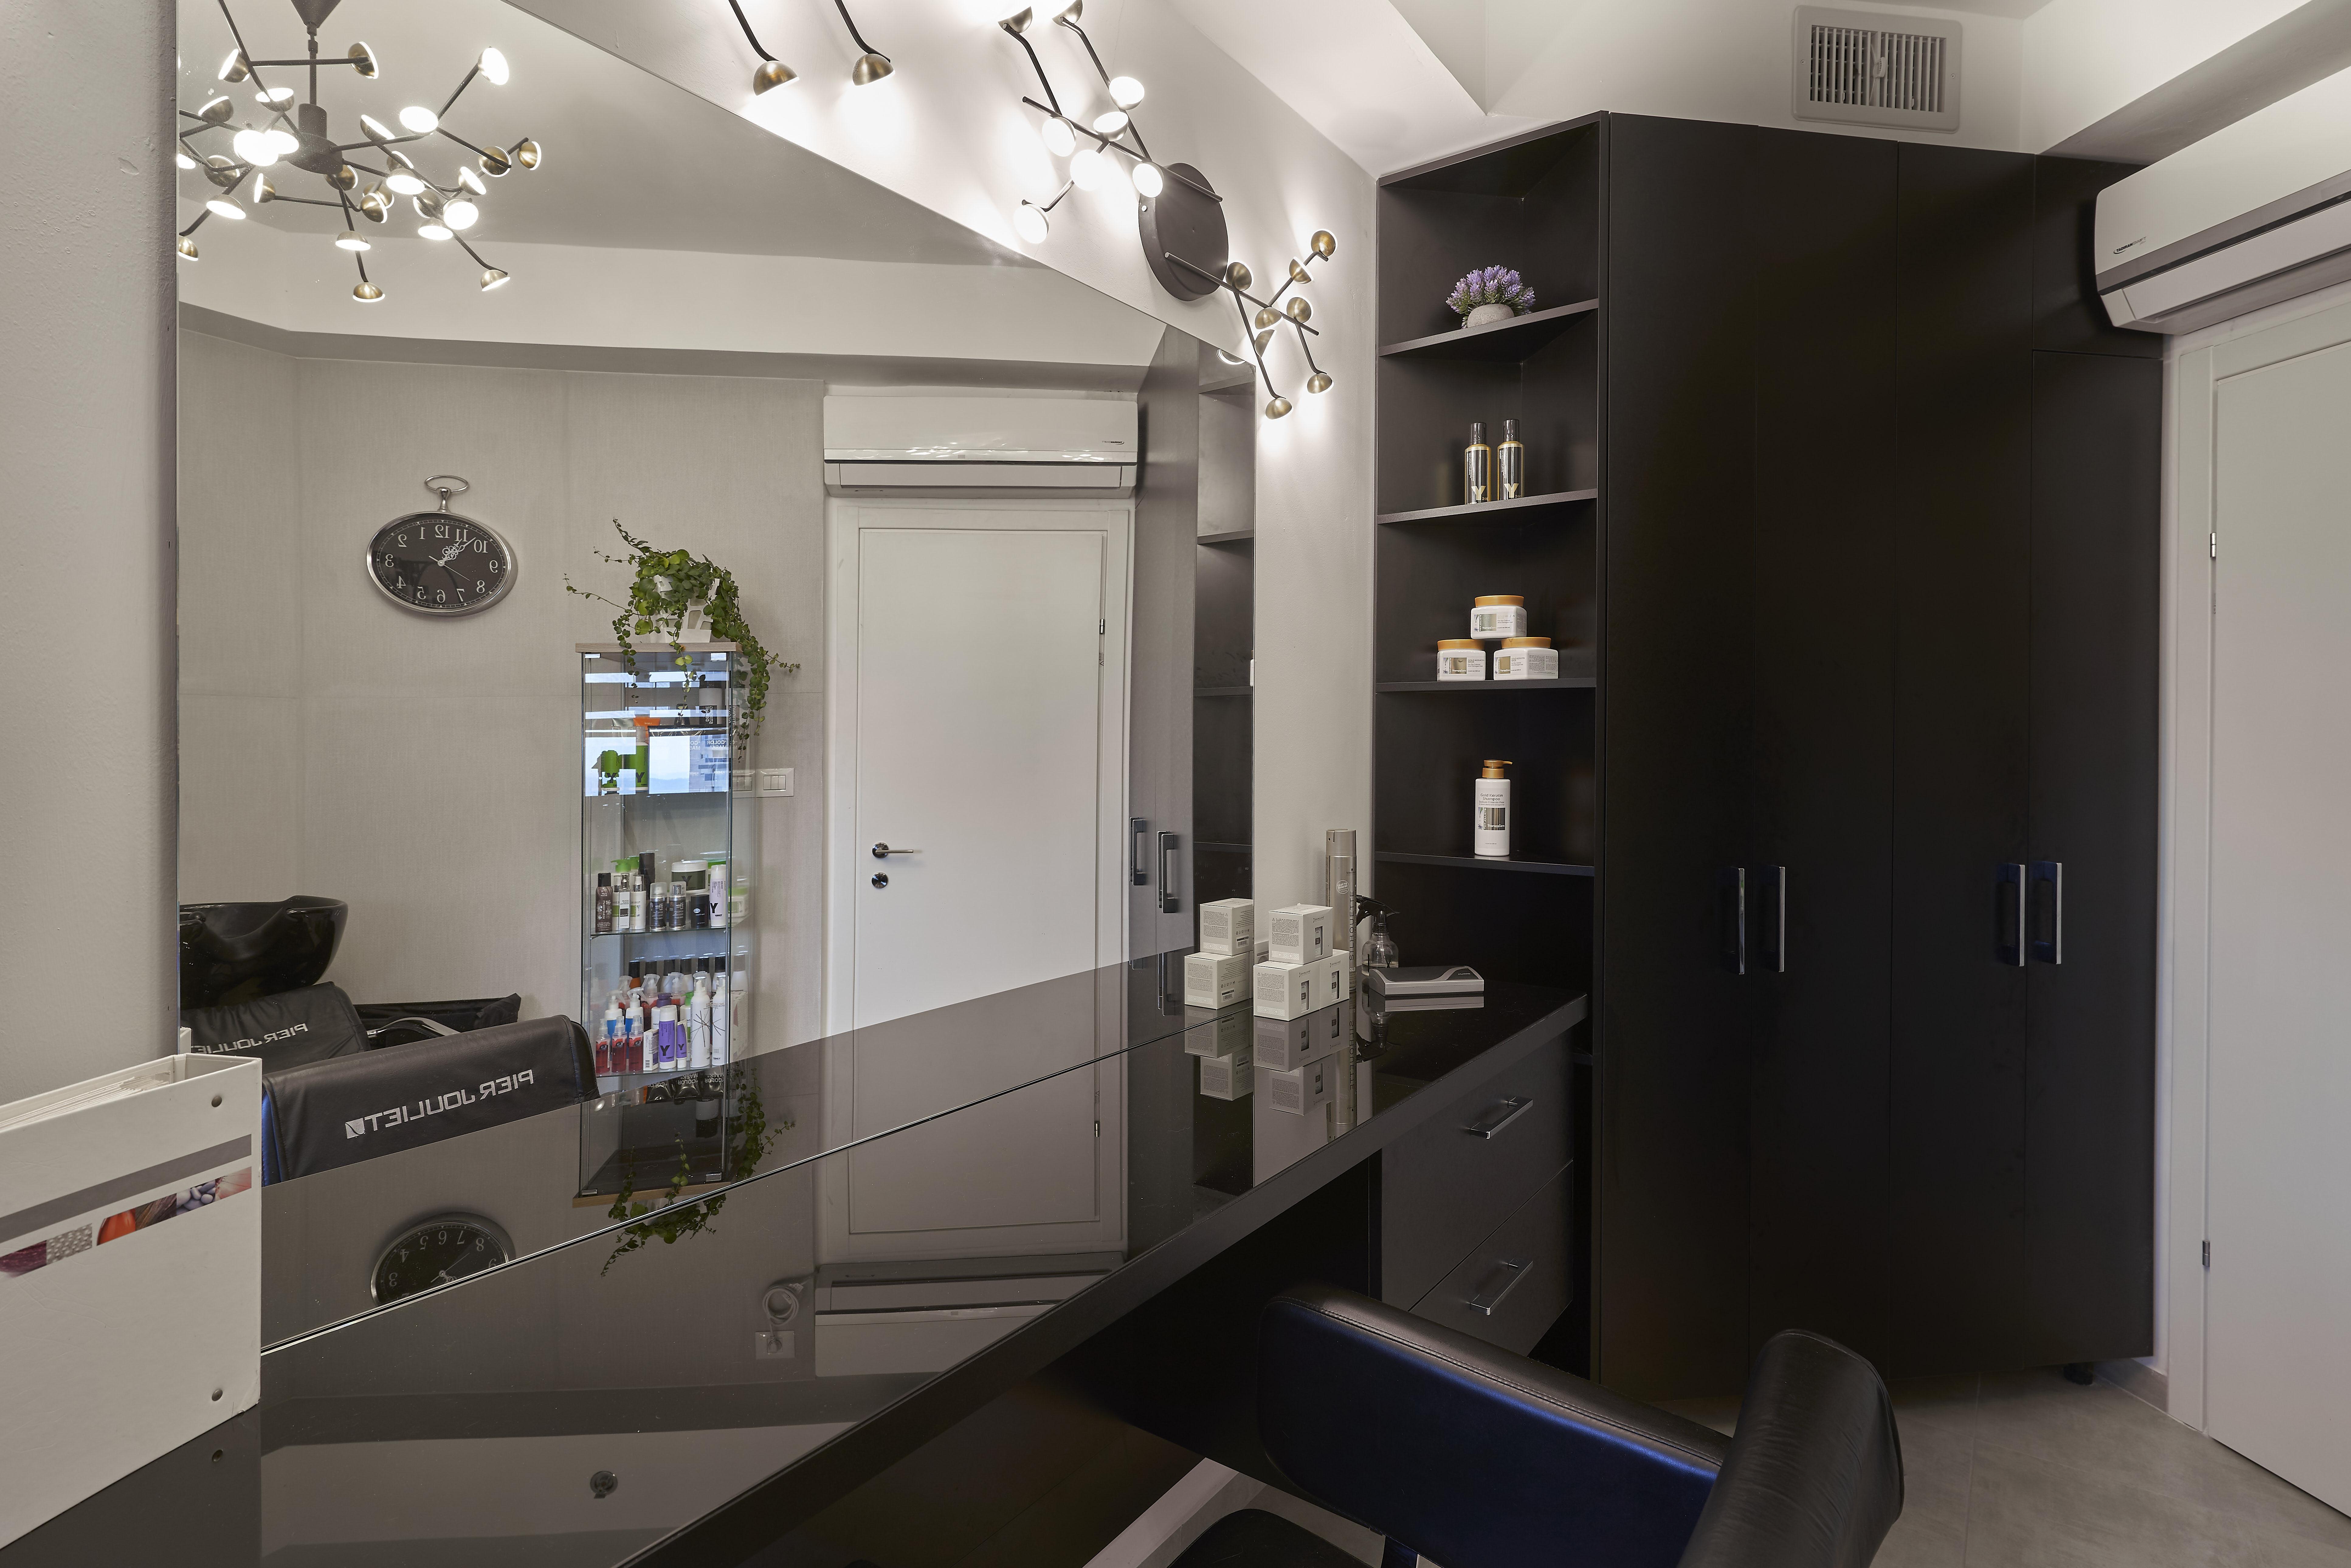 Lighting in Barbershop Design, תאורה בעיצוב מספרה